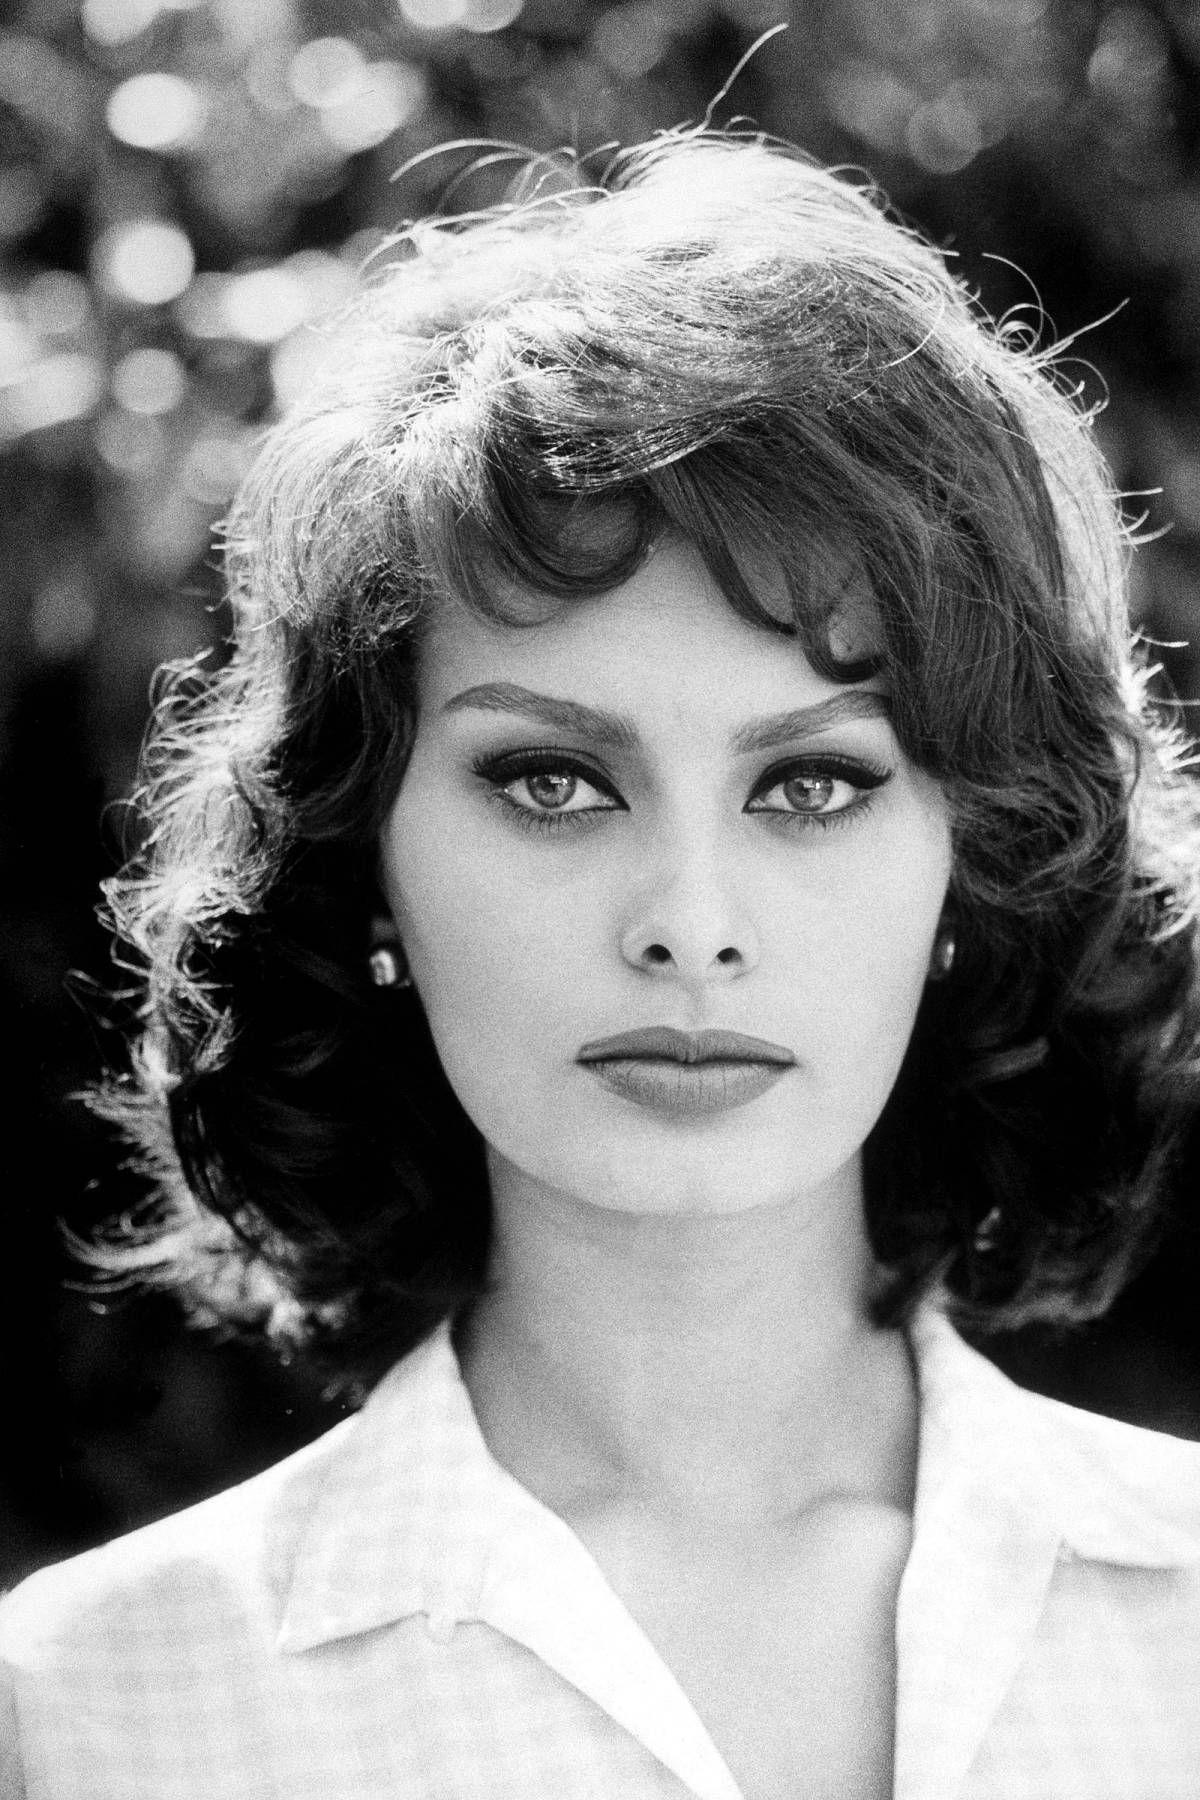 Photos of Sophia Loren - Sophia Loren In Photos